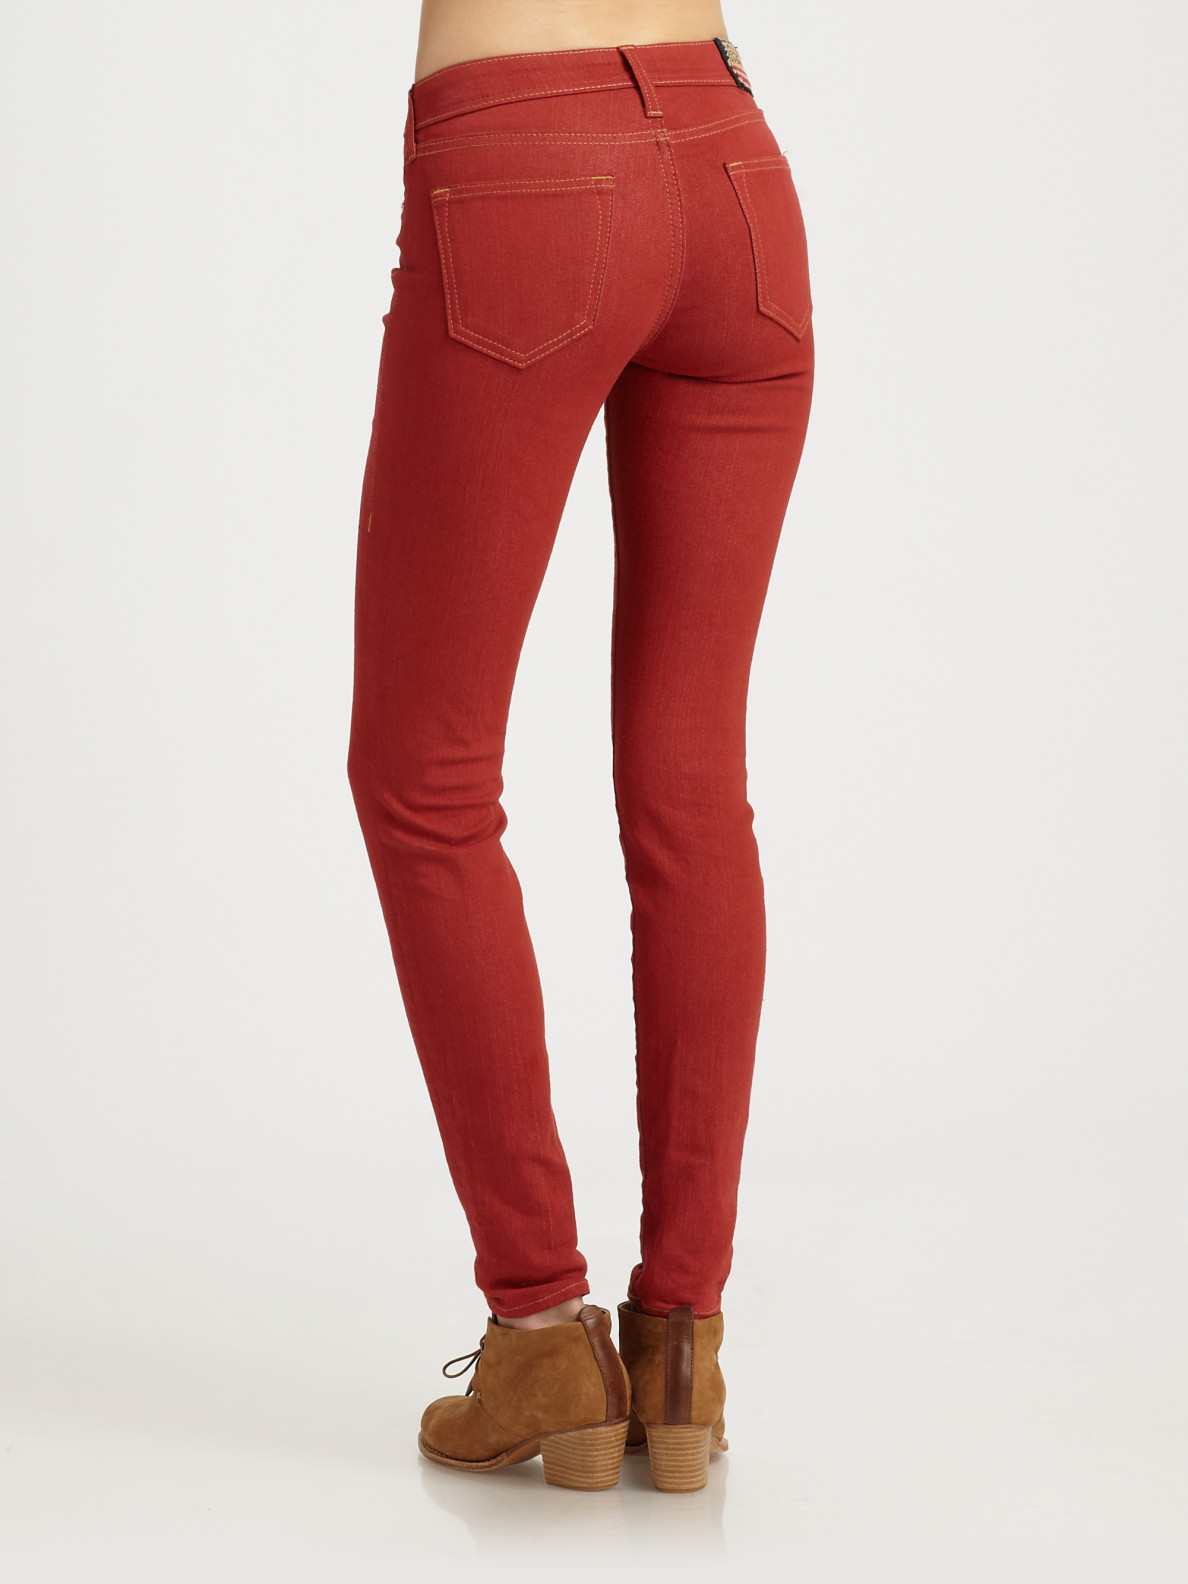 True religion world tour skinny jeans